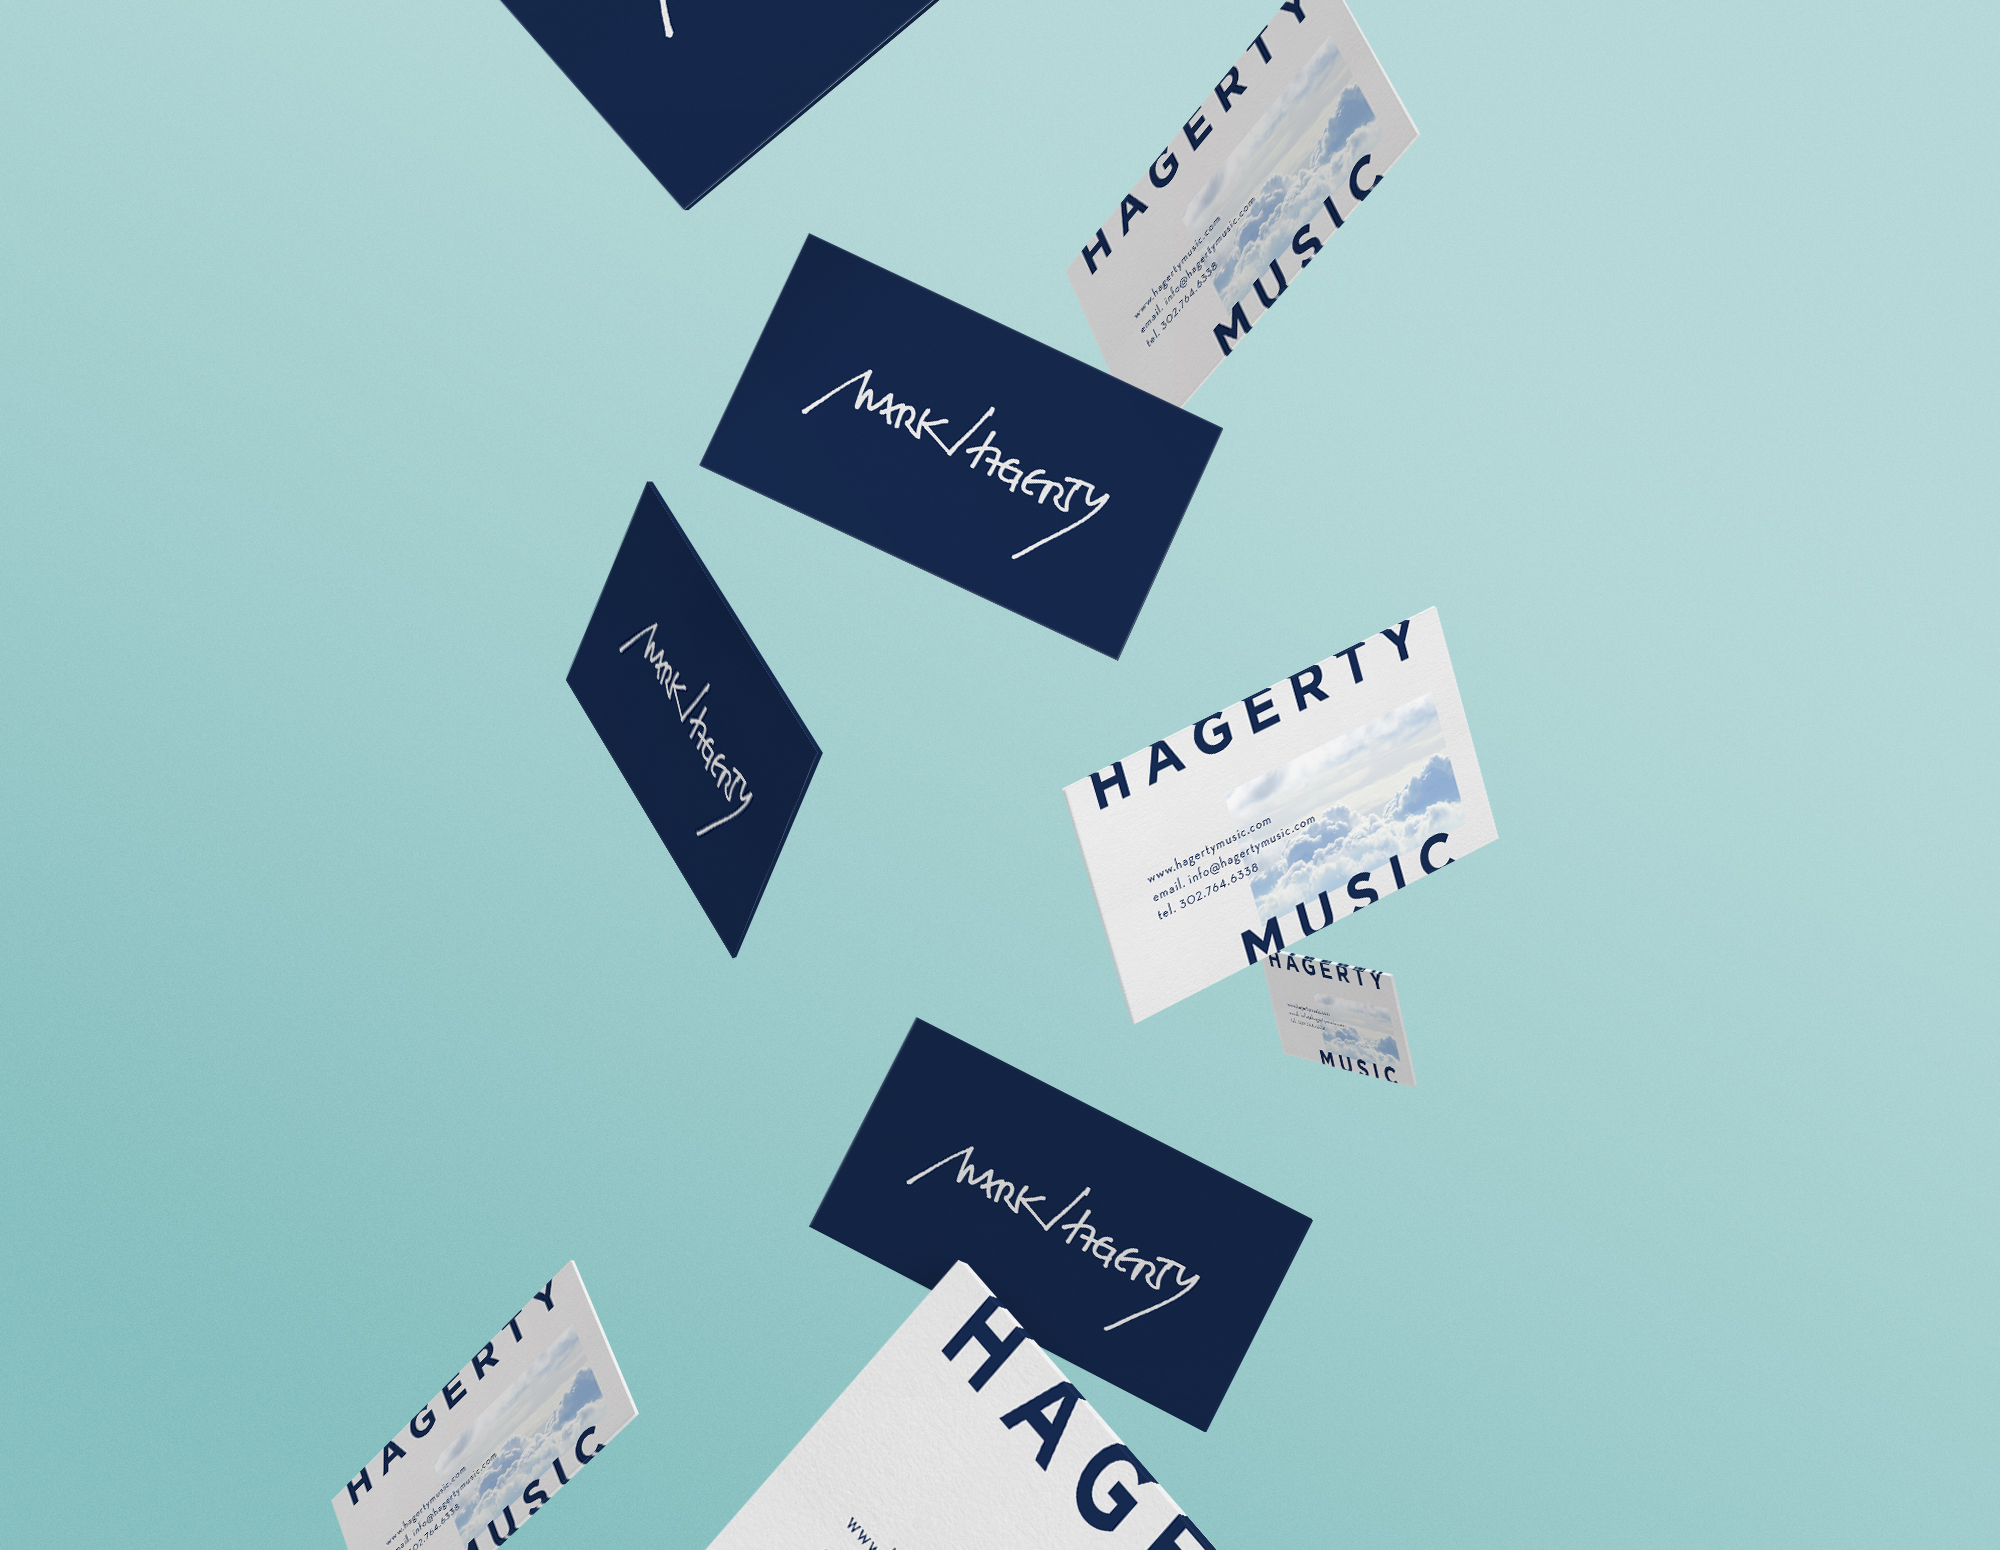 Mark-Hagerty-Music-Composer-Modern-Graphic-Business-Card-Design-Delaware.jpg